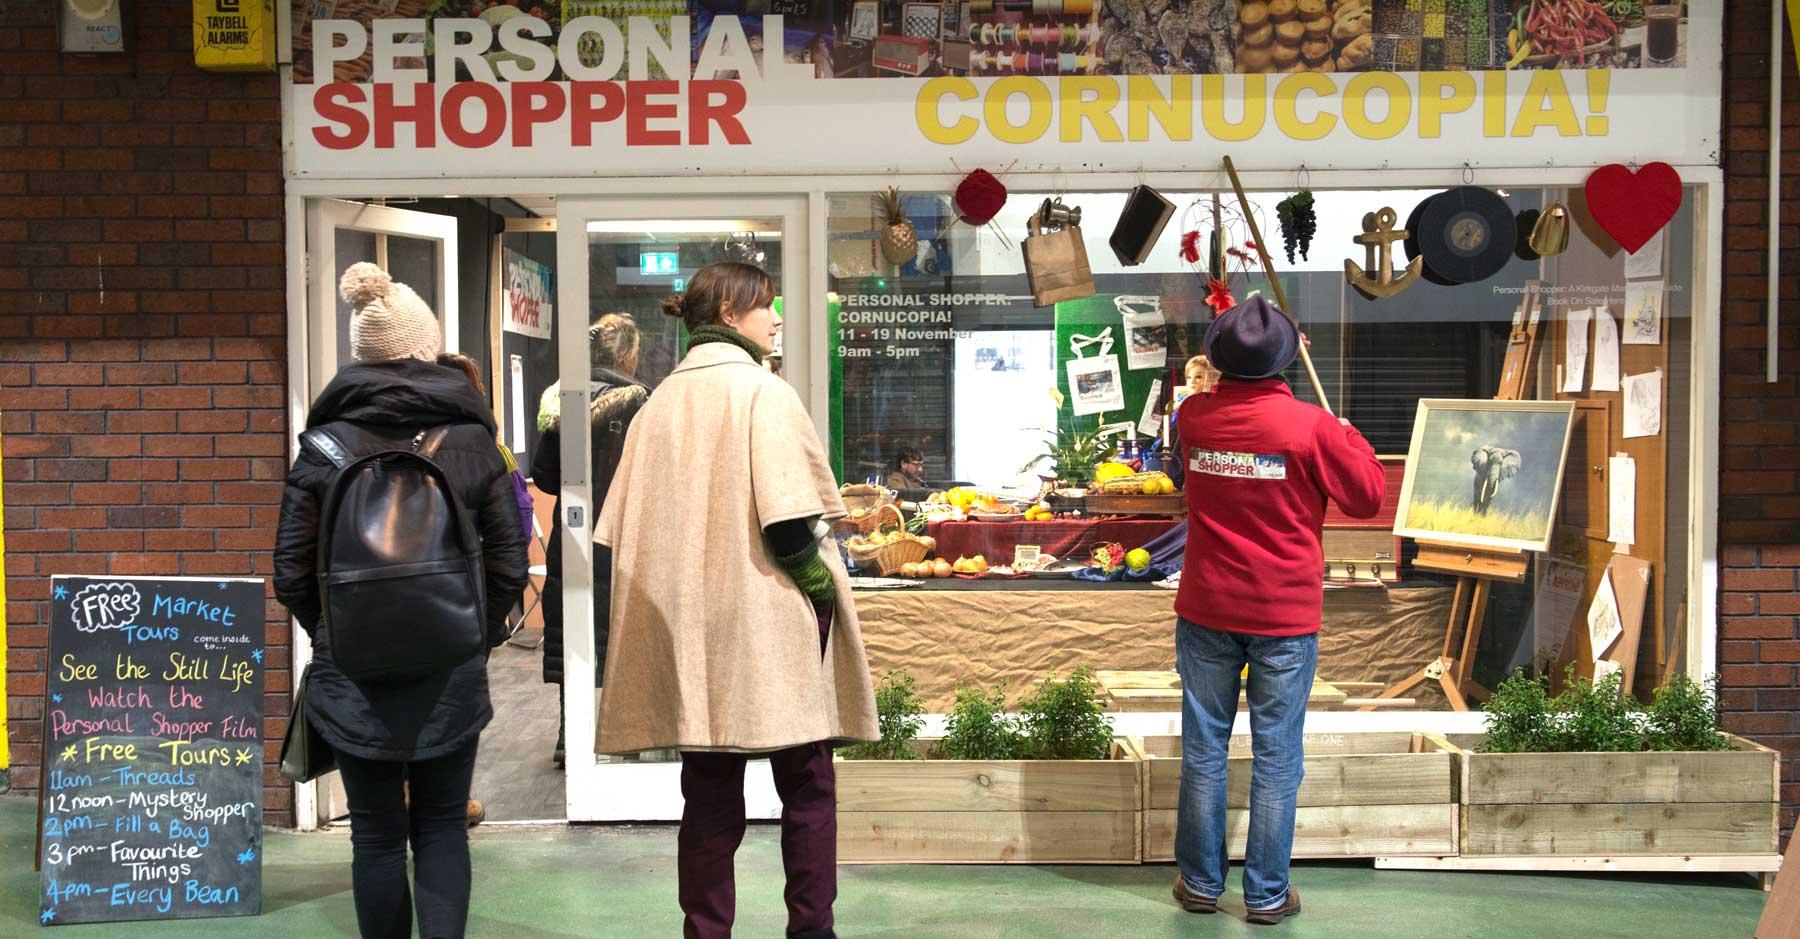 Personal Shopper: Cornucopia